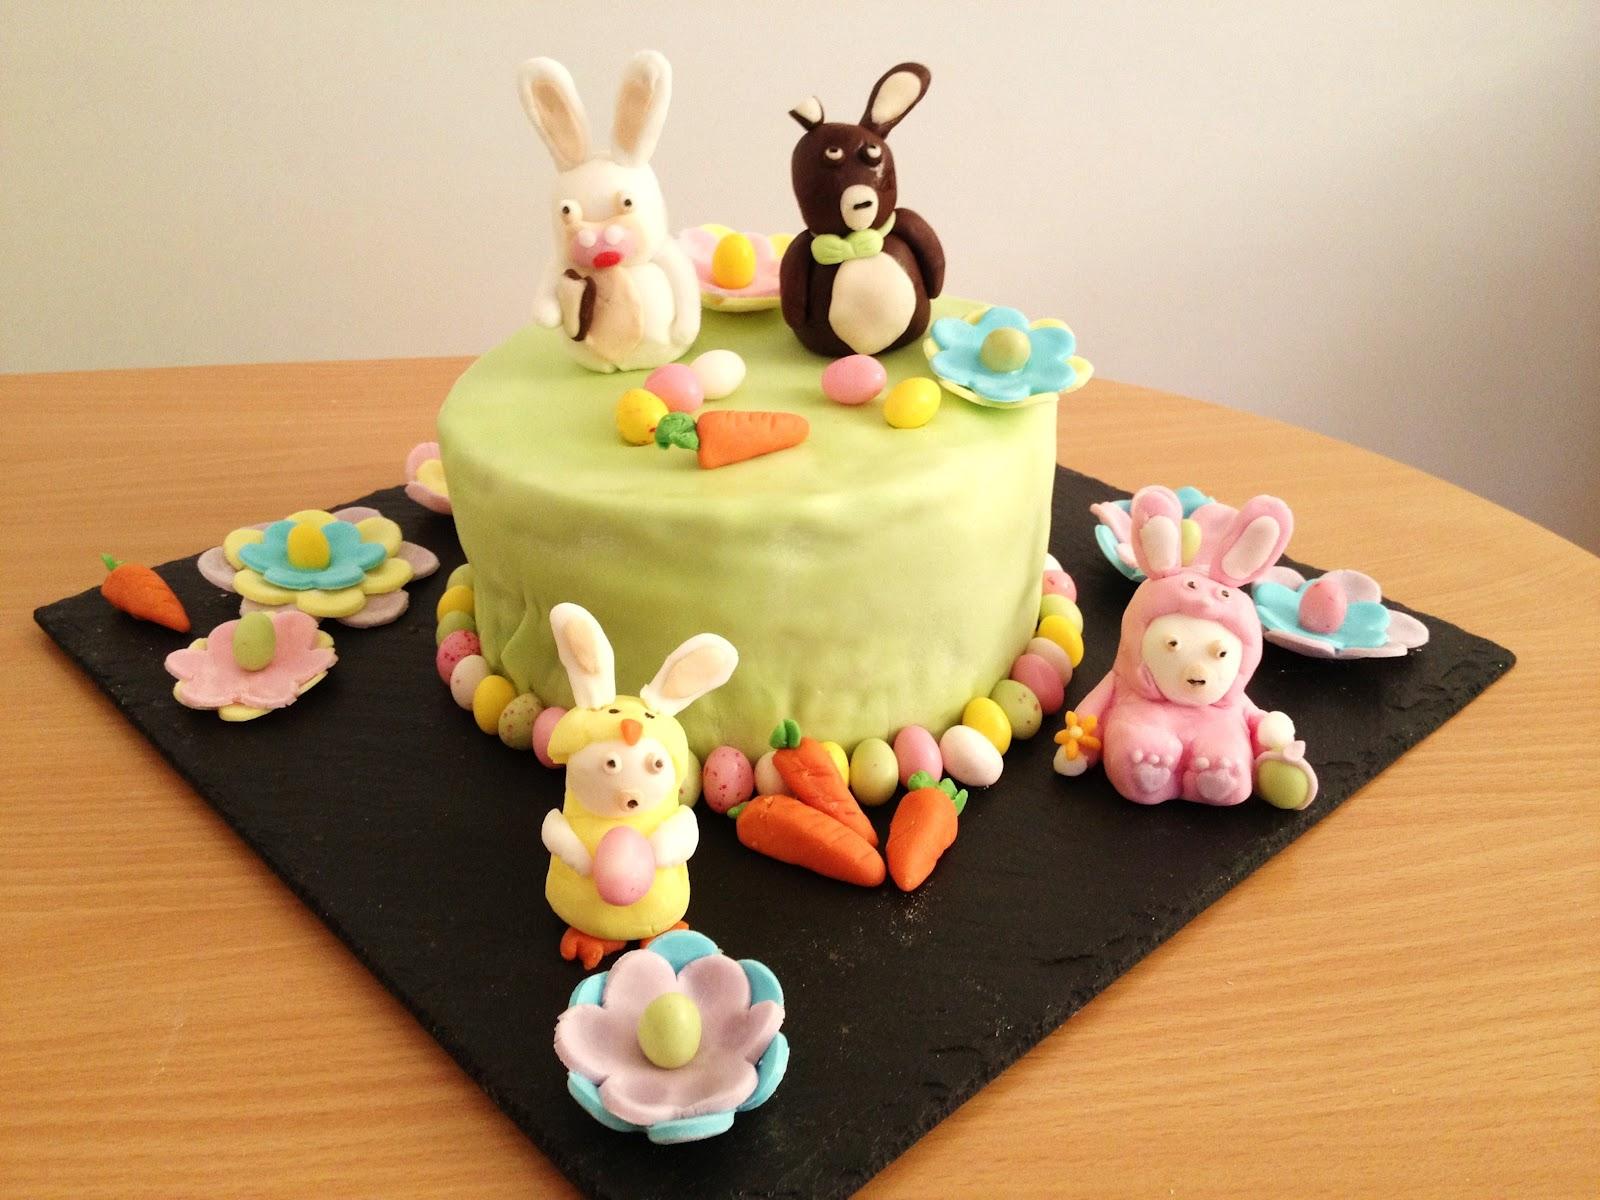 fabtastic cakes g teau les lapins cr tins f tent p ques. Black Bedroom Furniture Sets. Home Design Ideas